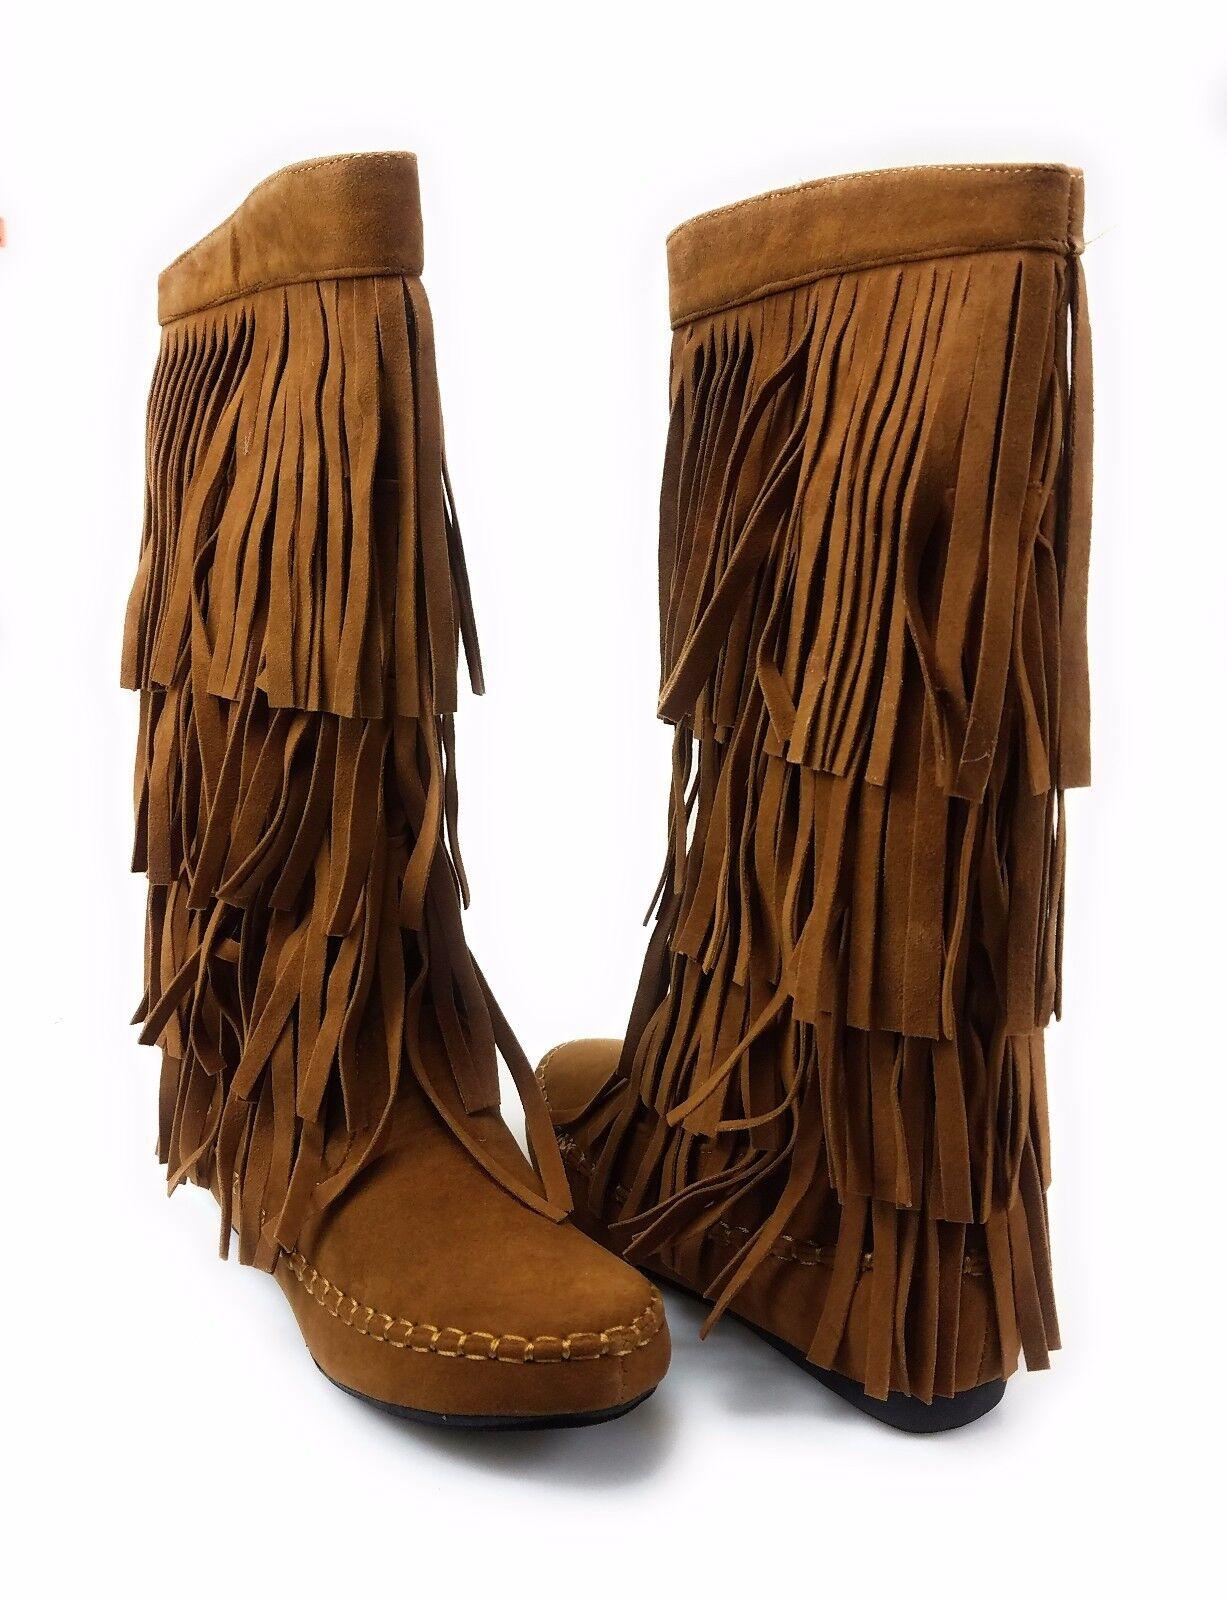 Womens 4 Layer Fringe Flat Flat Flat Boots Moccasin Mid Calf Comfy Boots Rust Yoki Mudd-55 3020e3